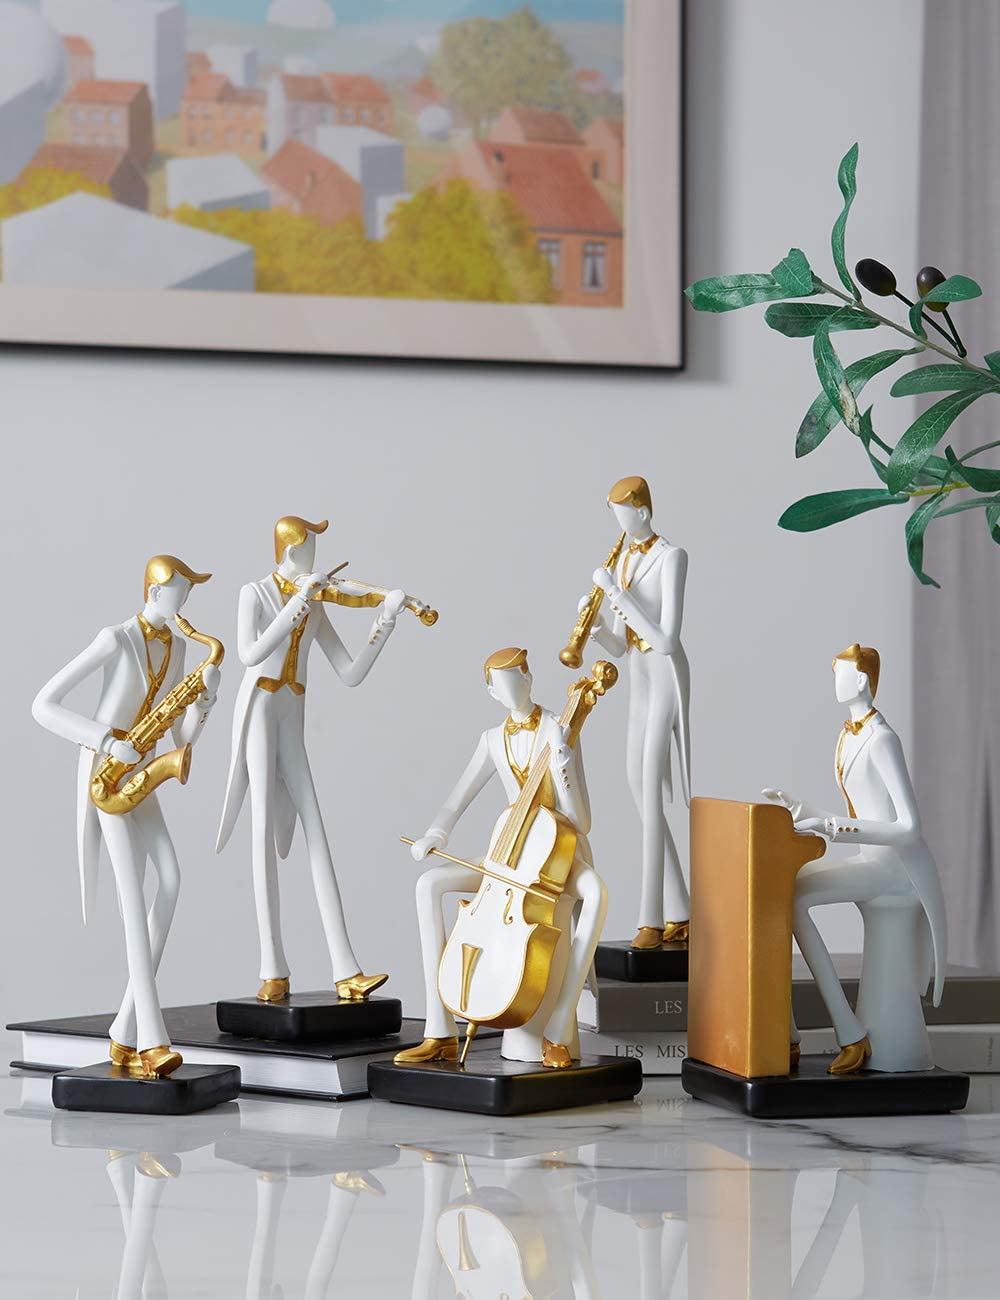 HauCoze Music Decor Musician Statue Sculpture Figurine Piano Gift Home Decoration Handmade Premium Souvenir Giftbox Safe Paint for Kids Polyresin 21.5cmH